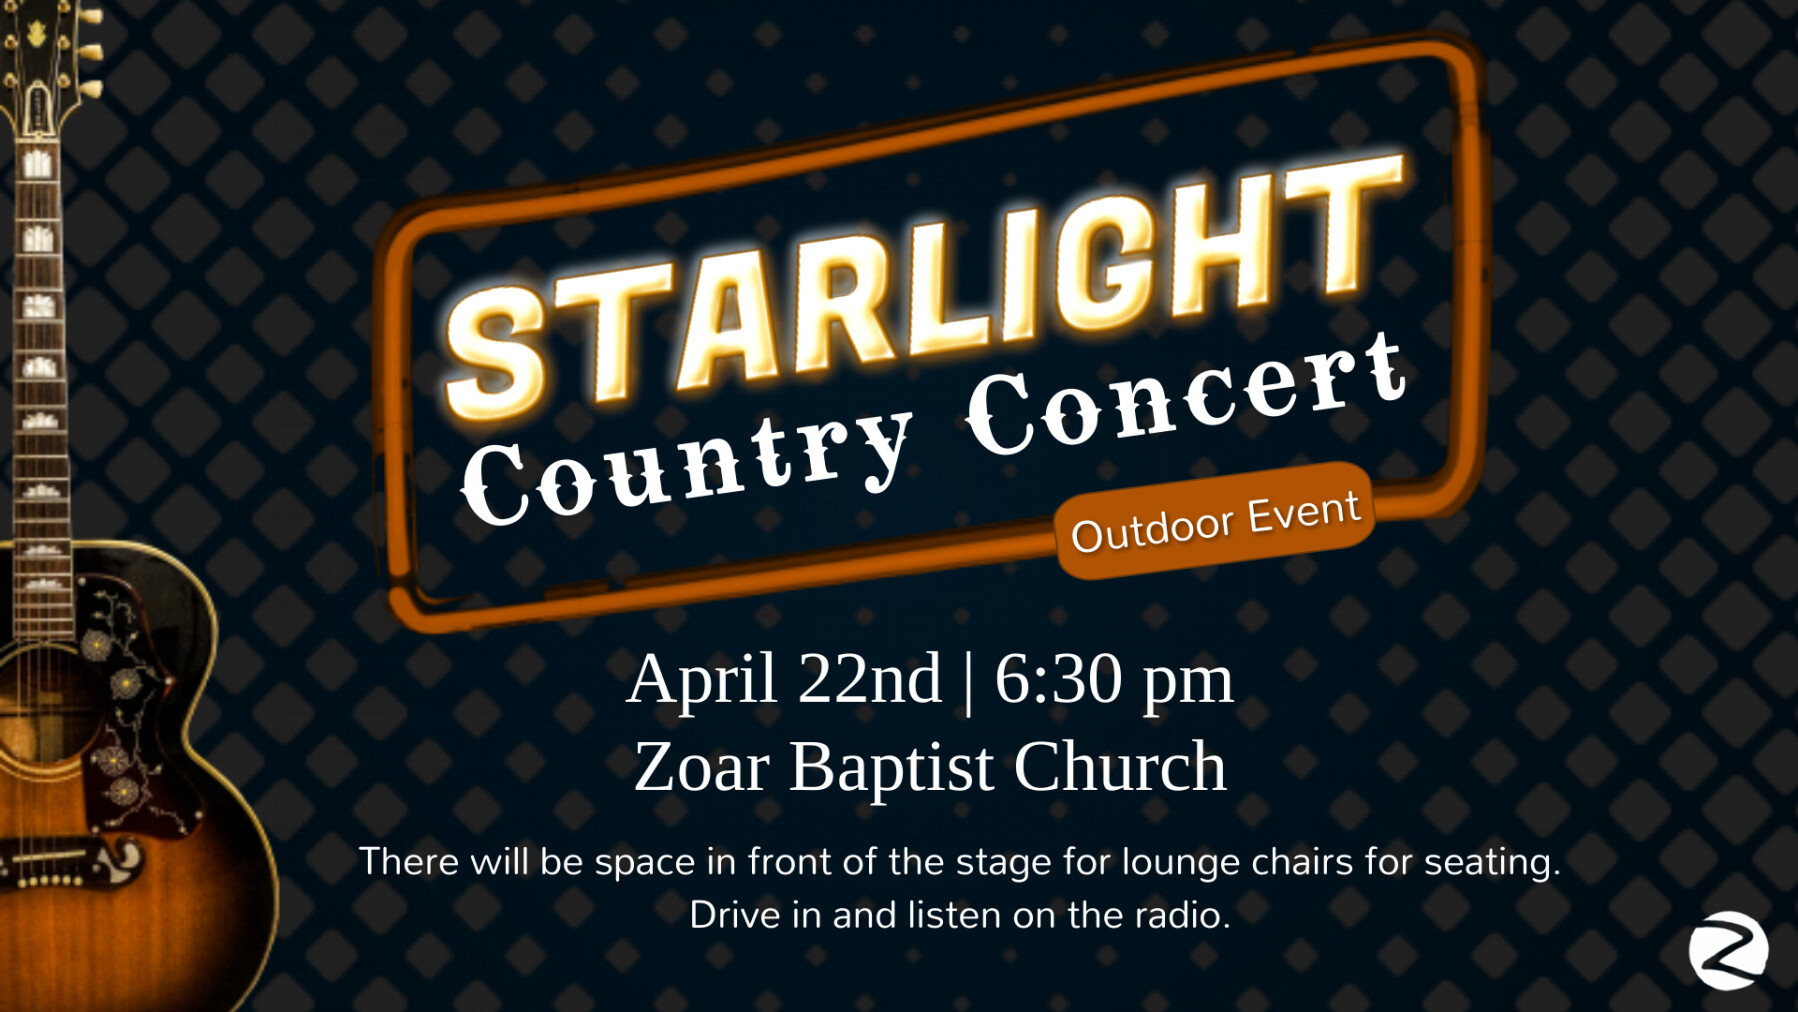 Starlight Country Opry